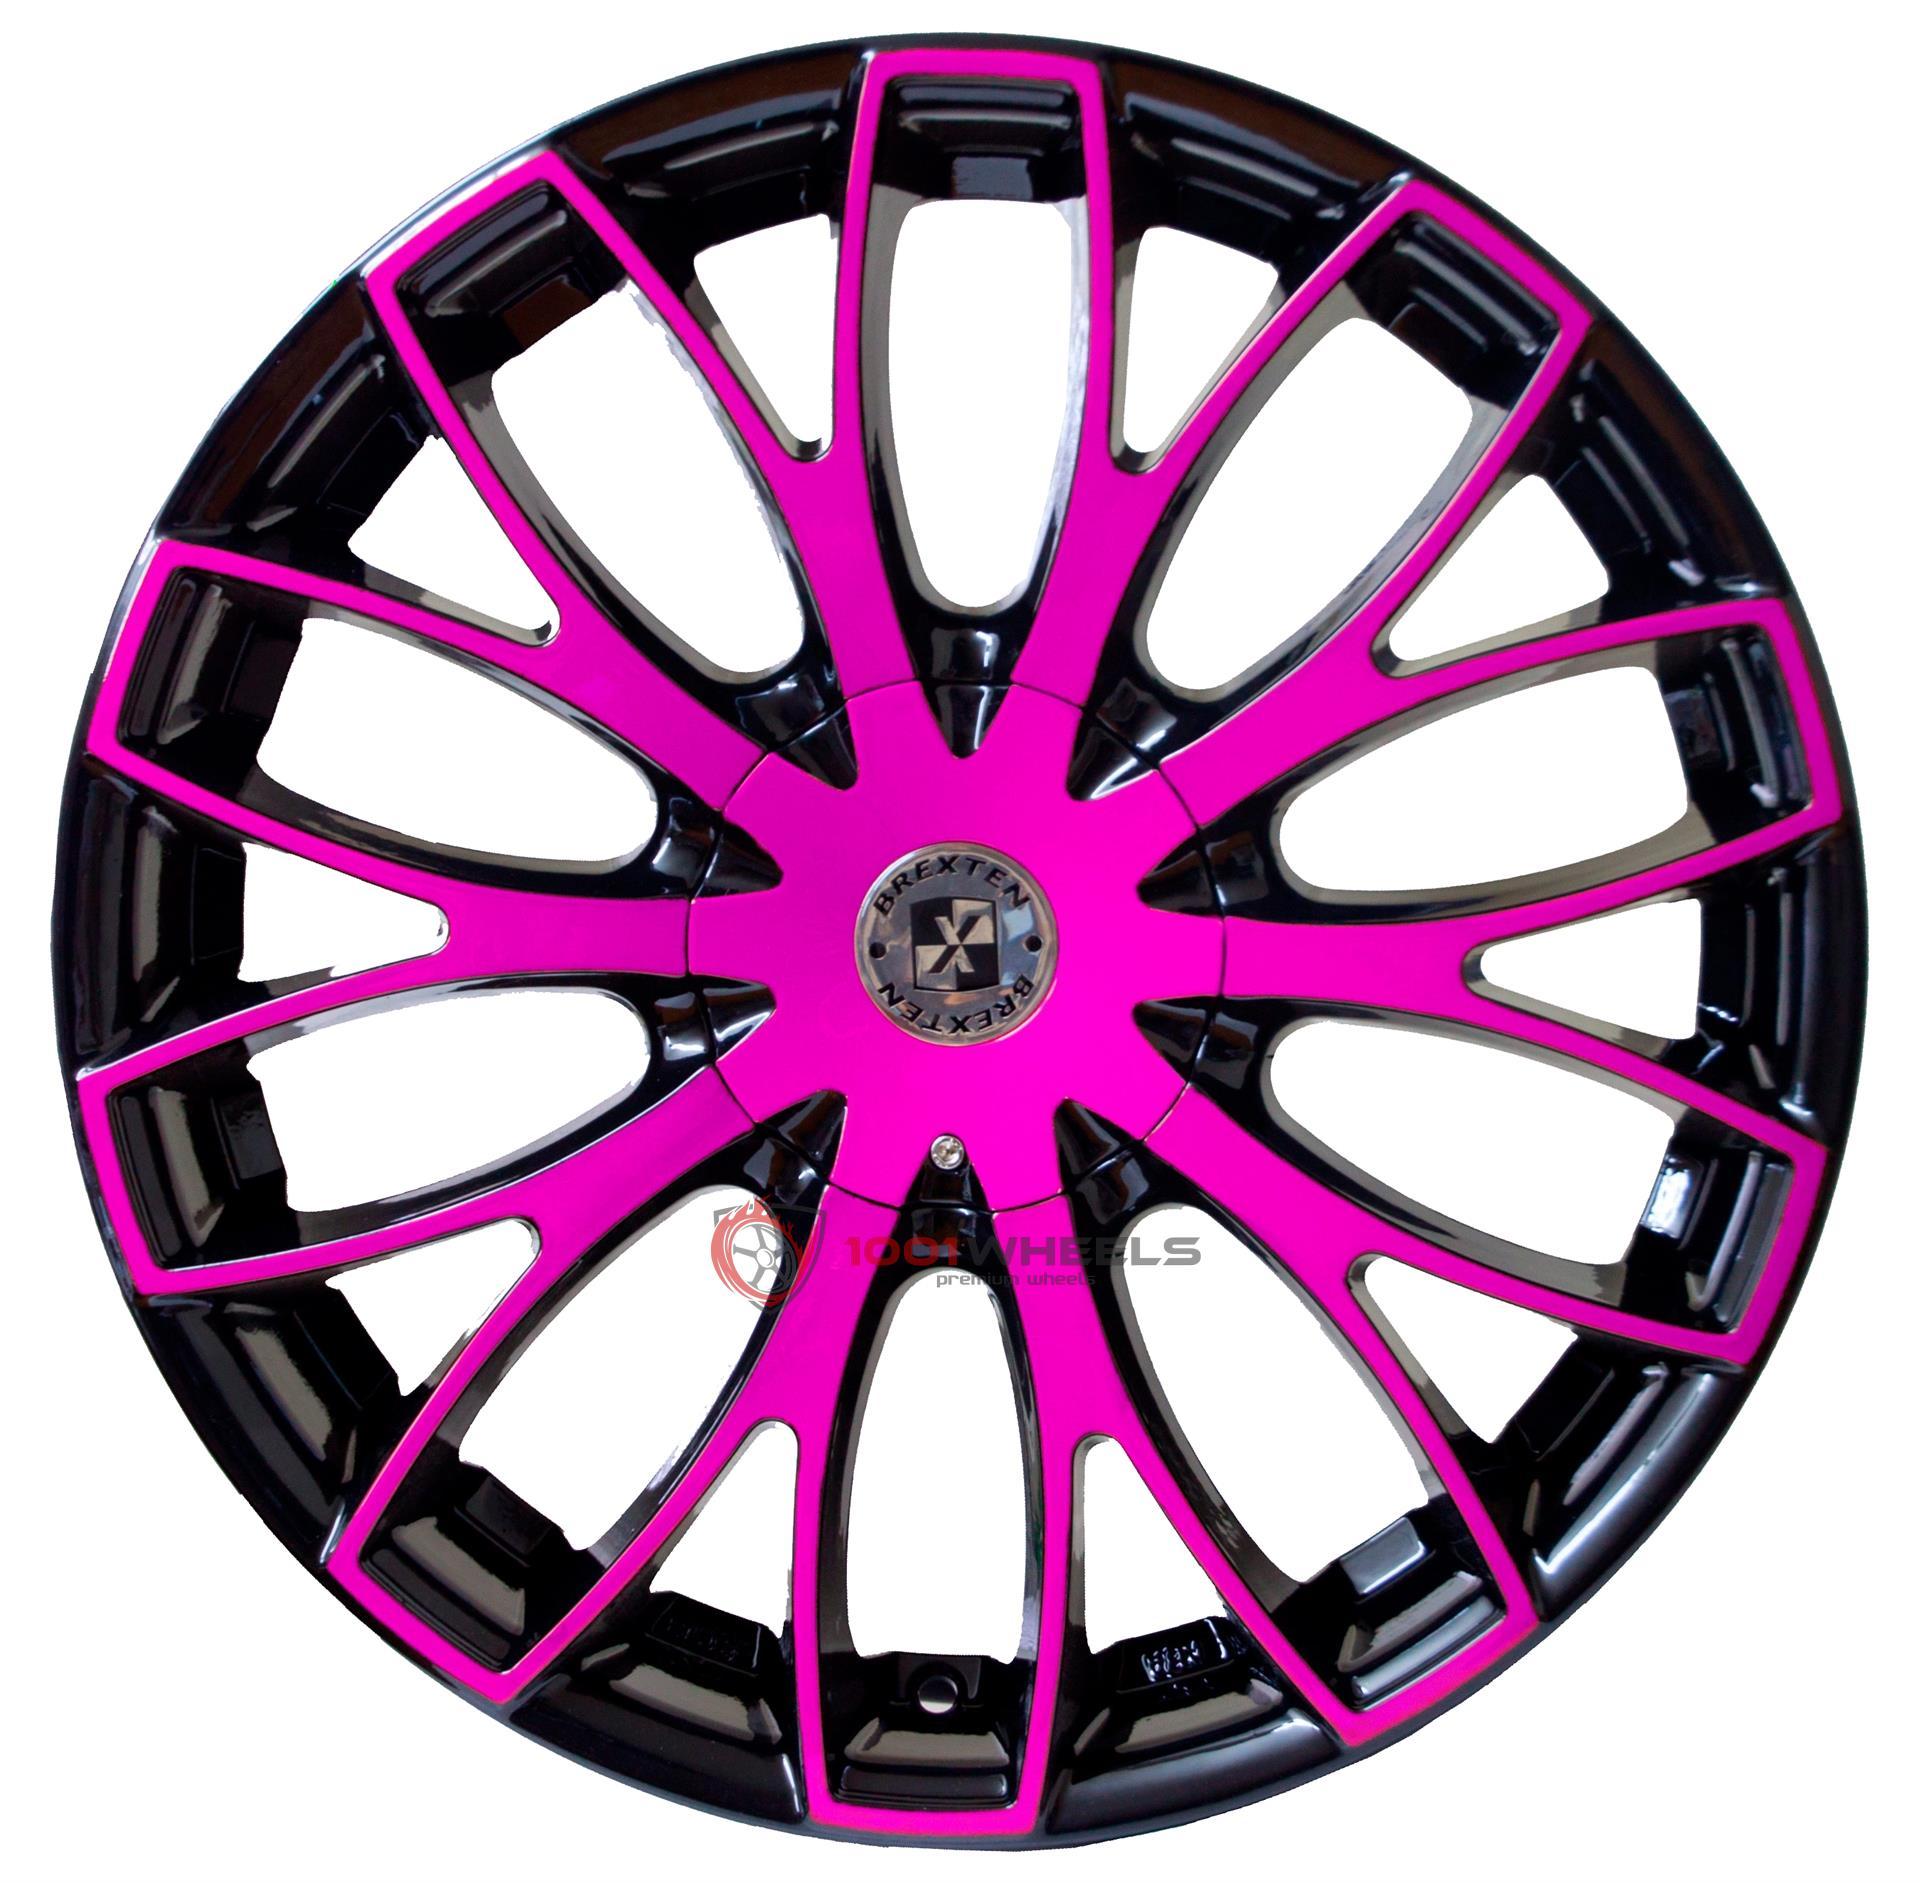 BREXTEN CUSTOM BX-20 black-and-pink